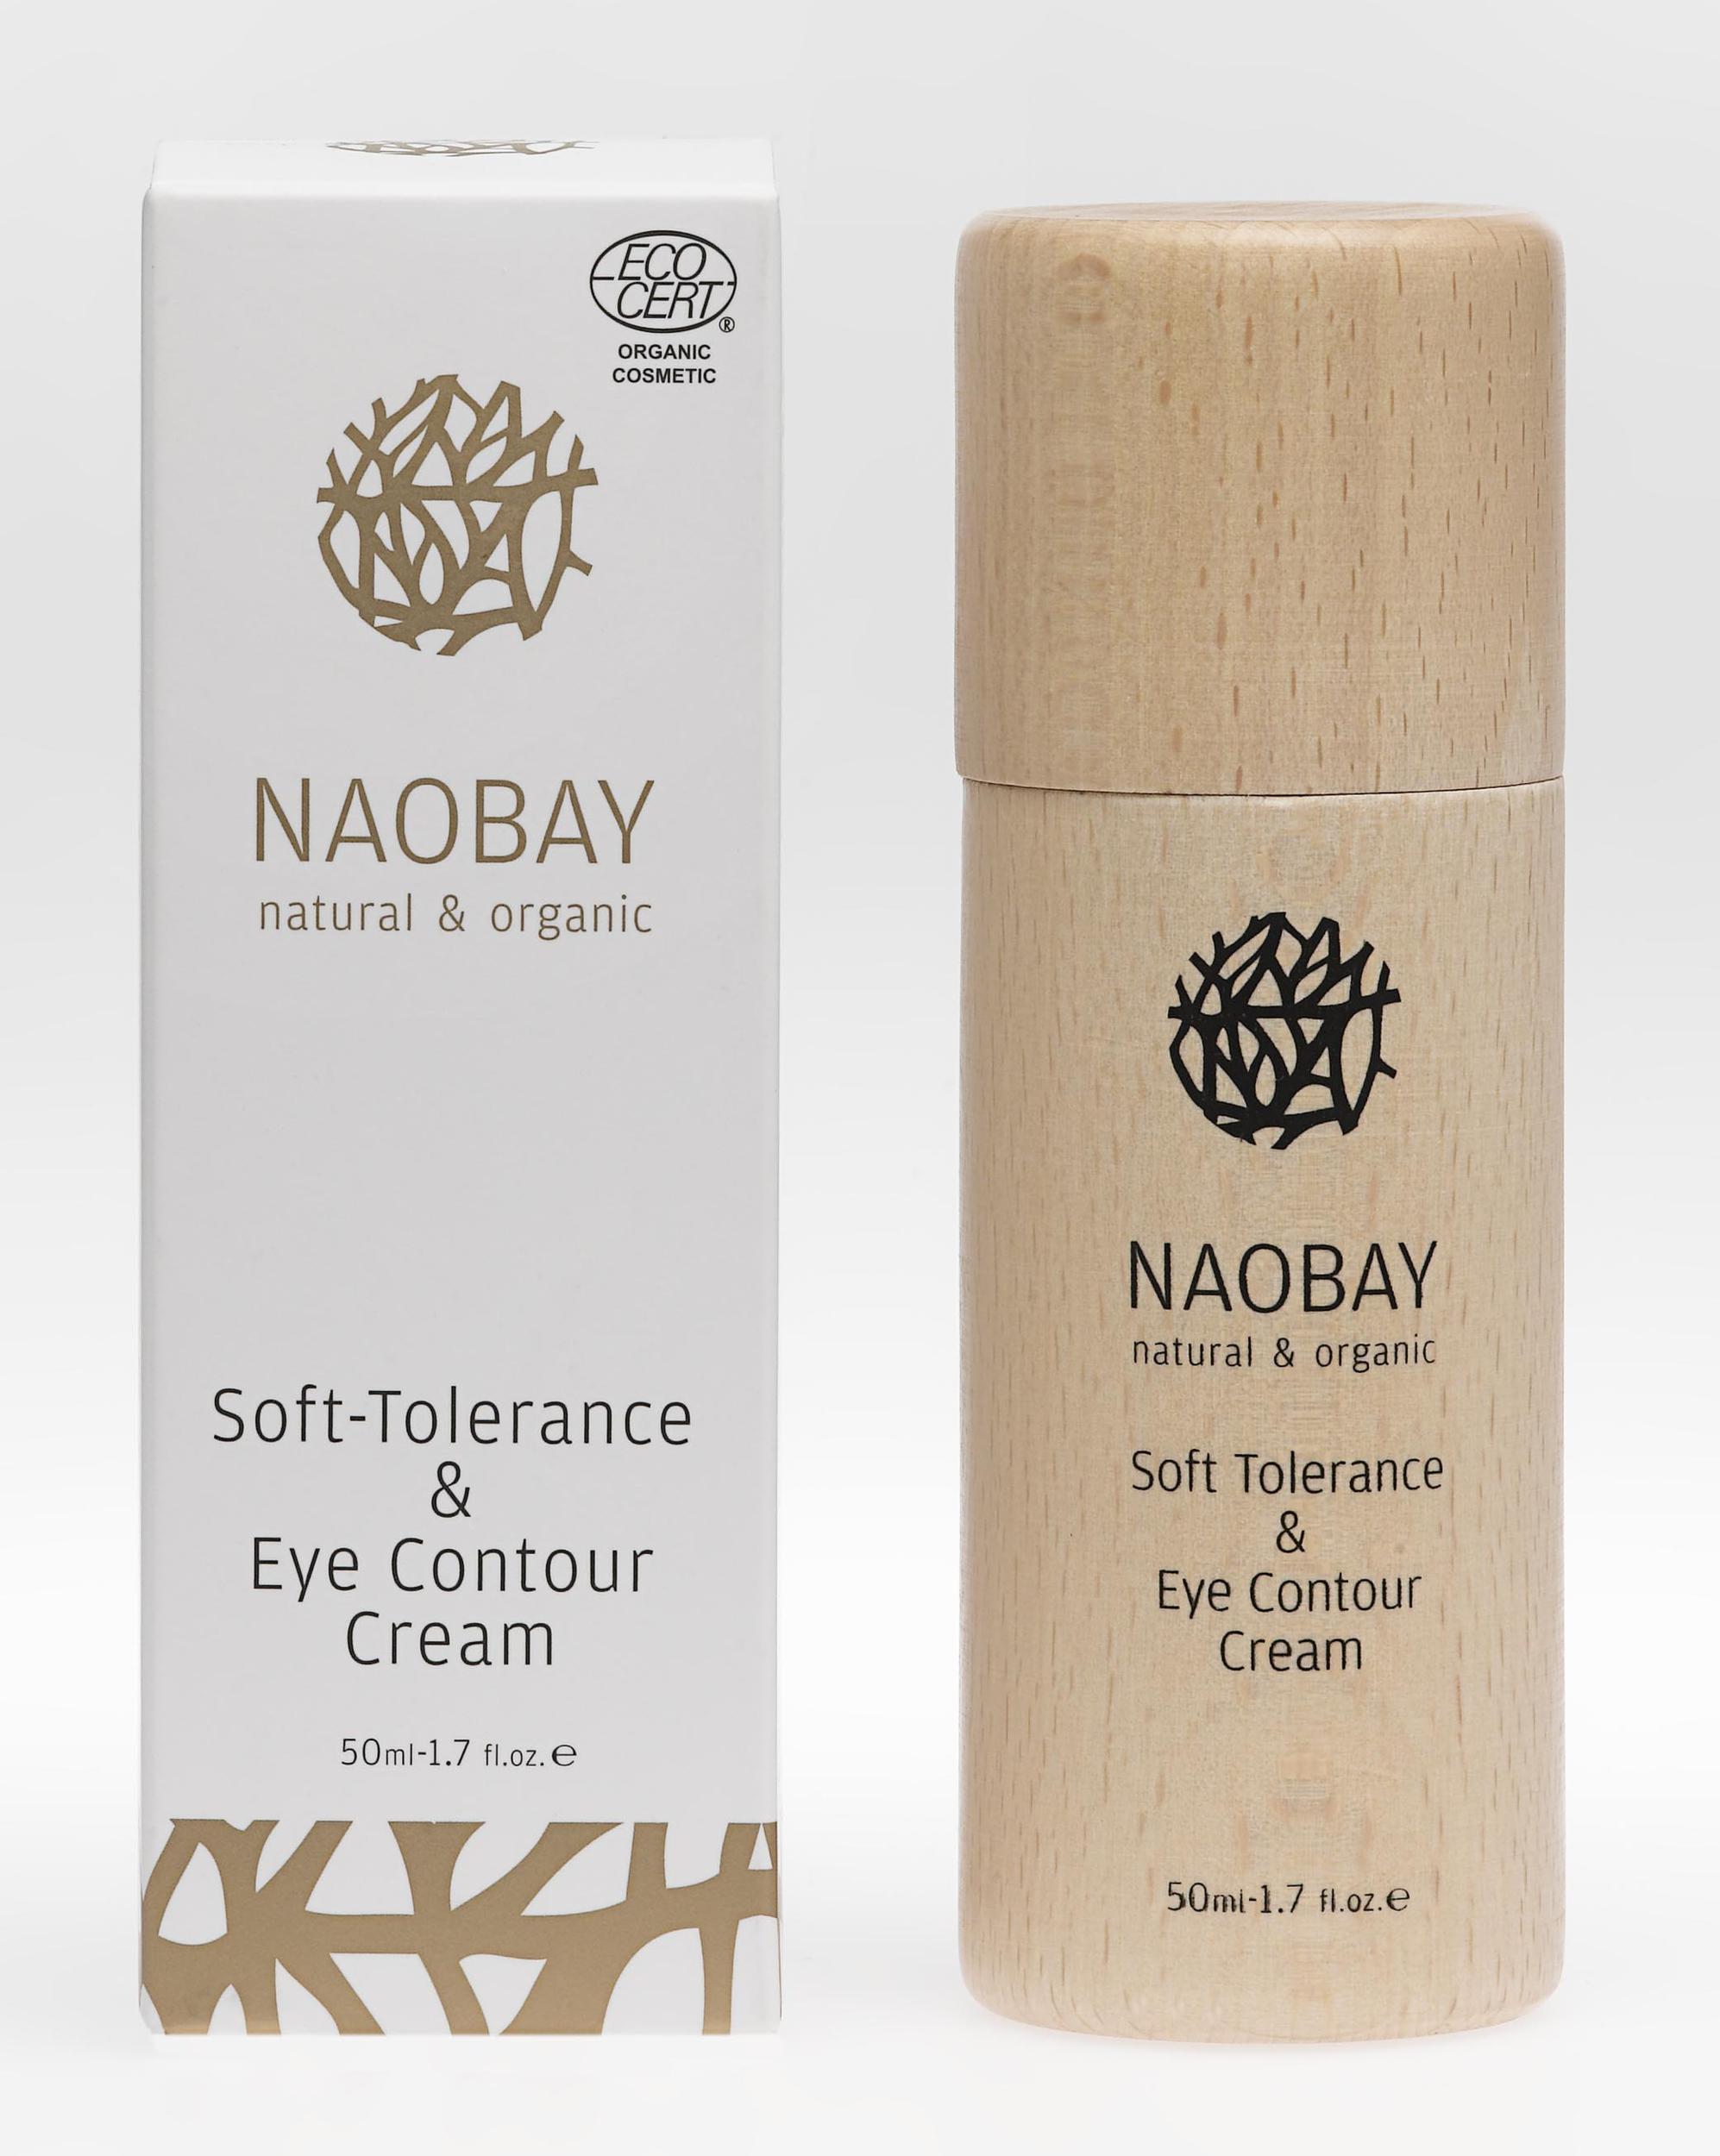 208 NAOBAY_CAJA_SOFT_TOLERANCE_&EYE_CREAM50ml